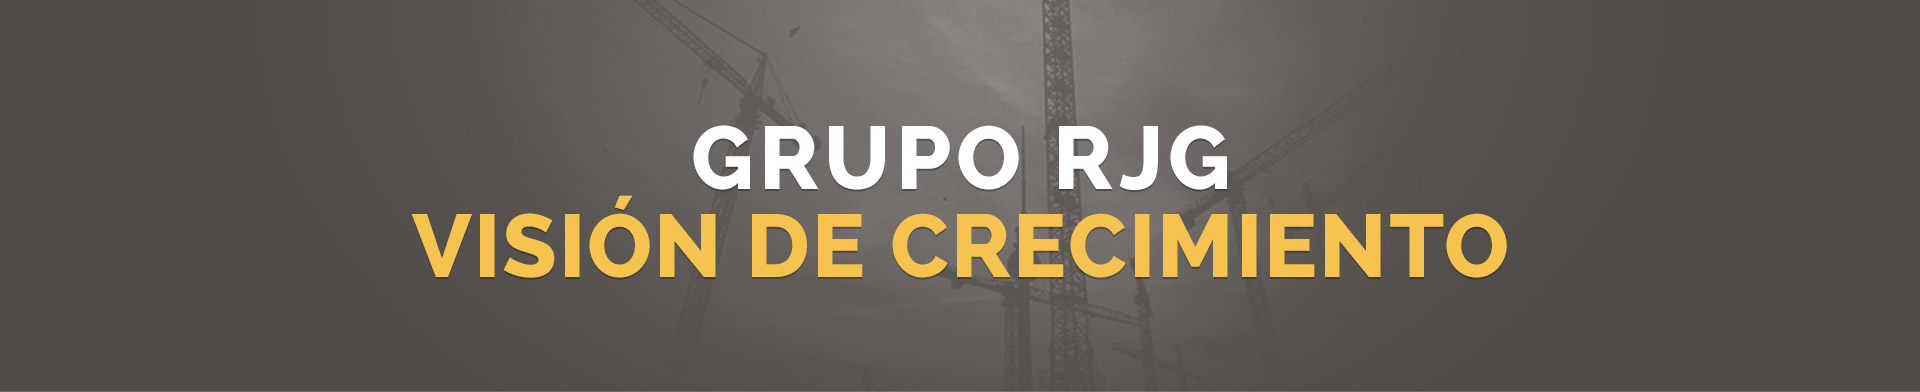 Grupo RJG